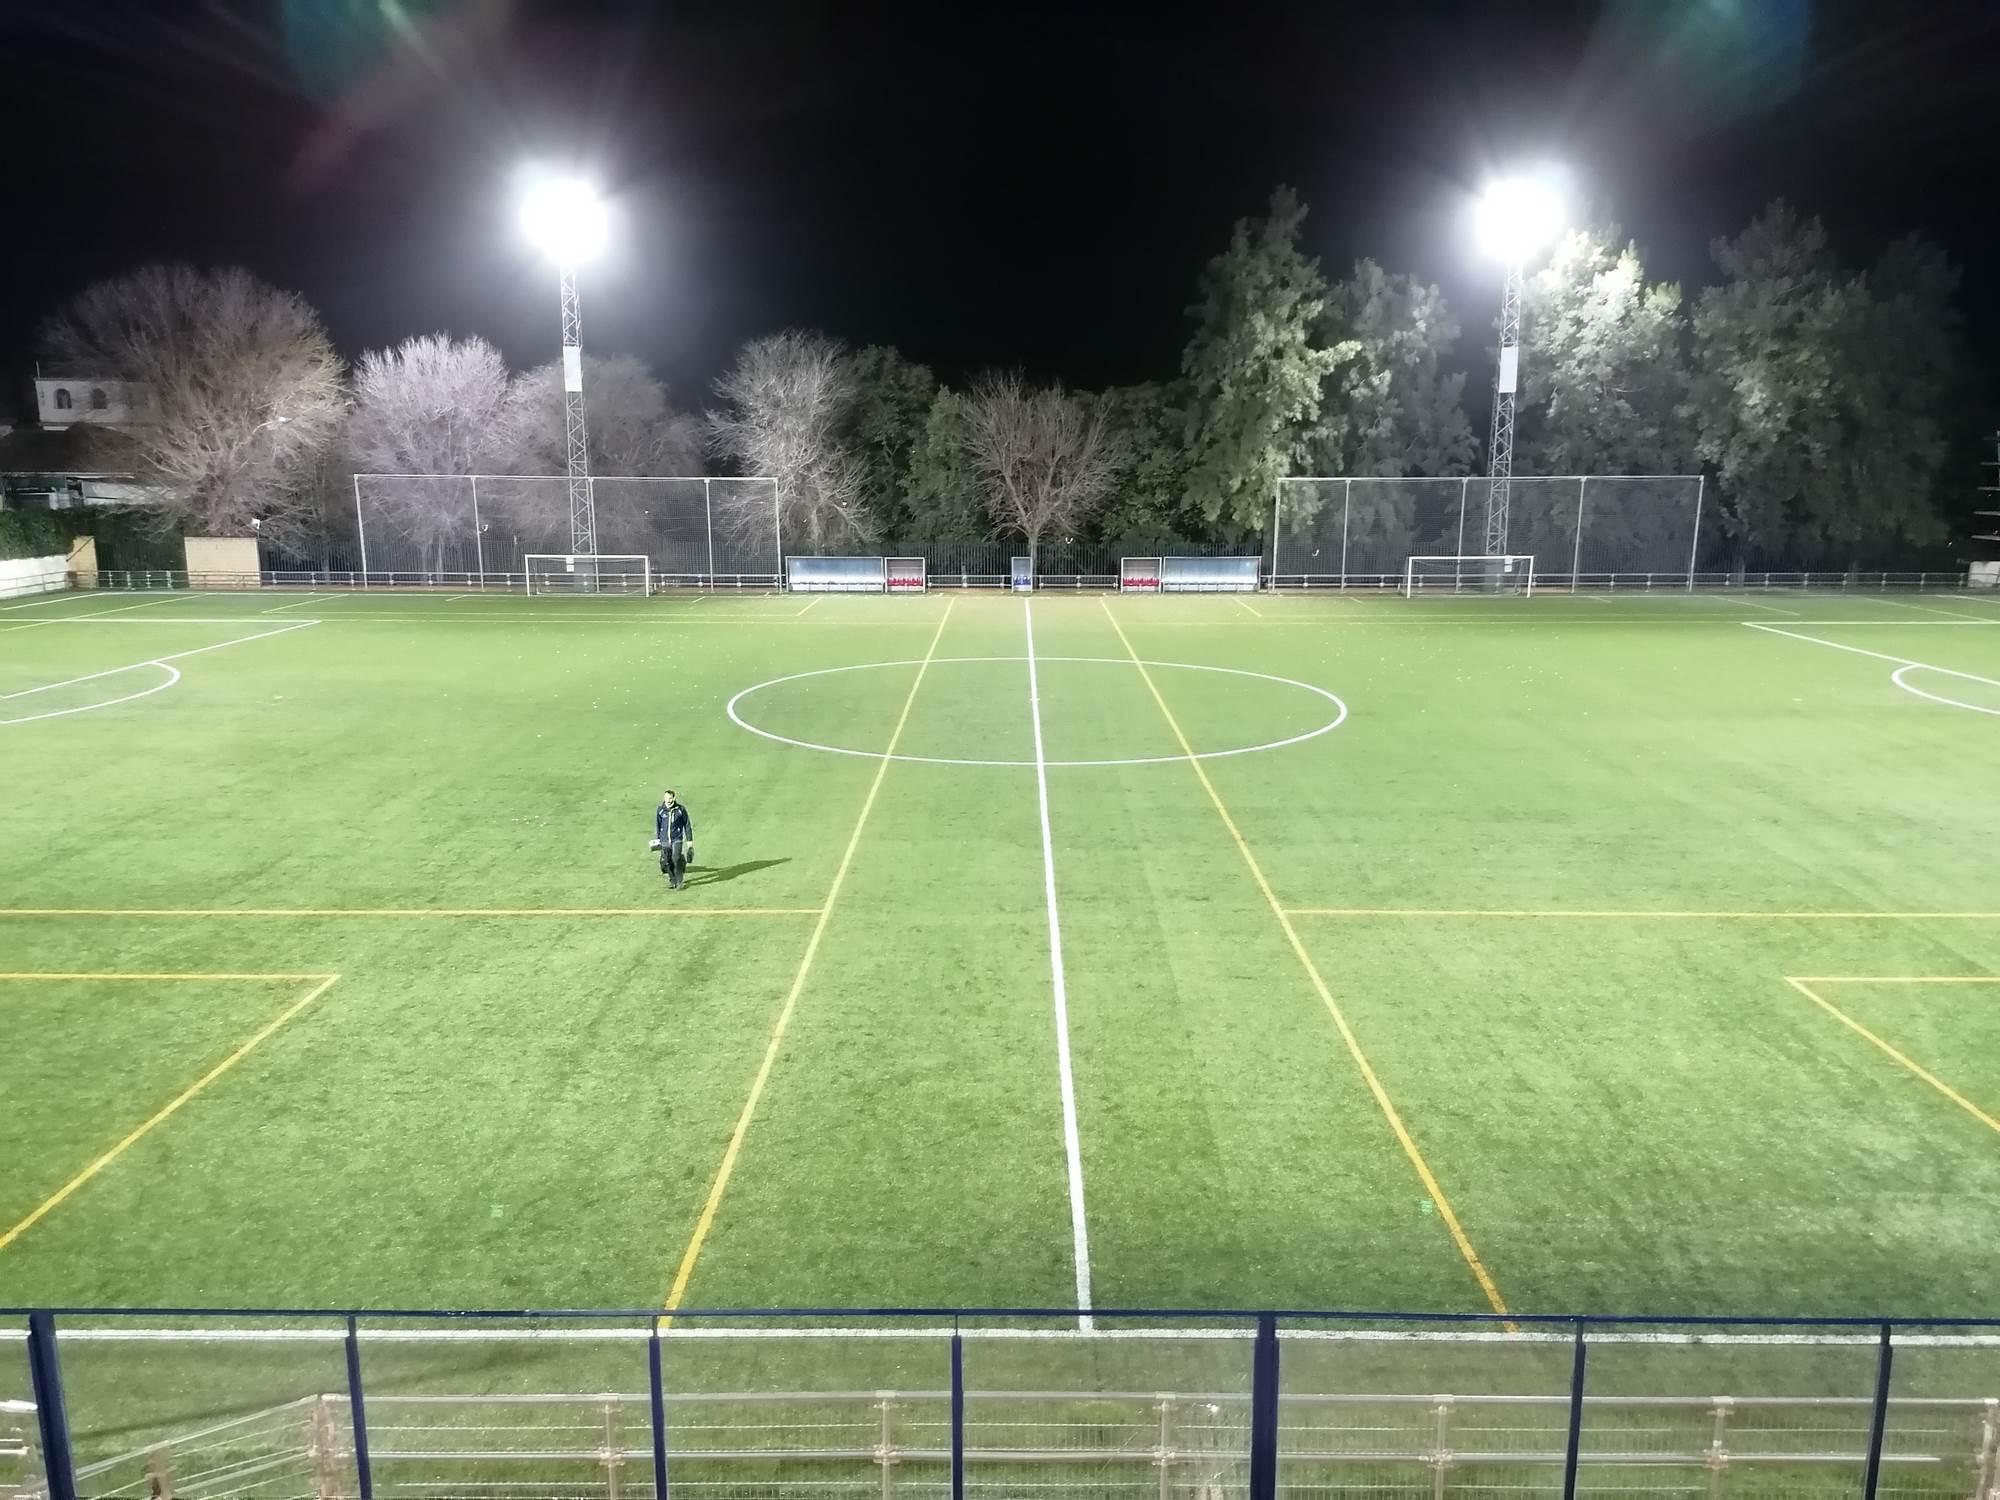 Campo de Fútbol Jozabed Sánchez Ruiz, Mairena del Alcor (Sevilla)